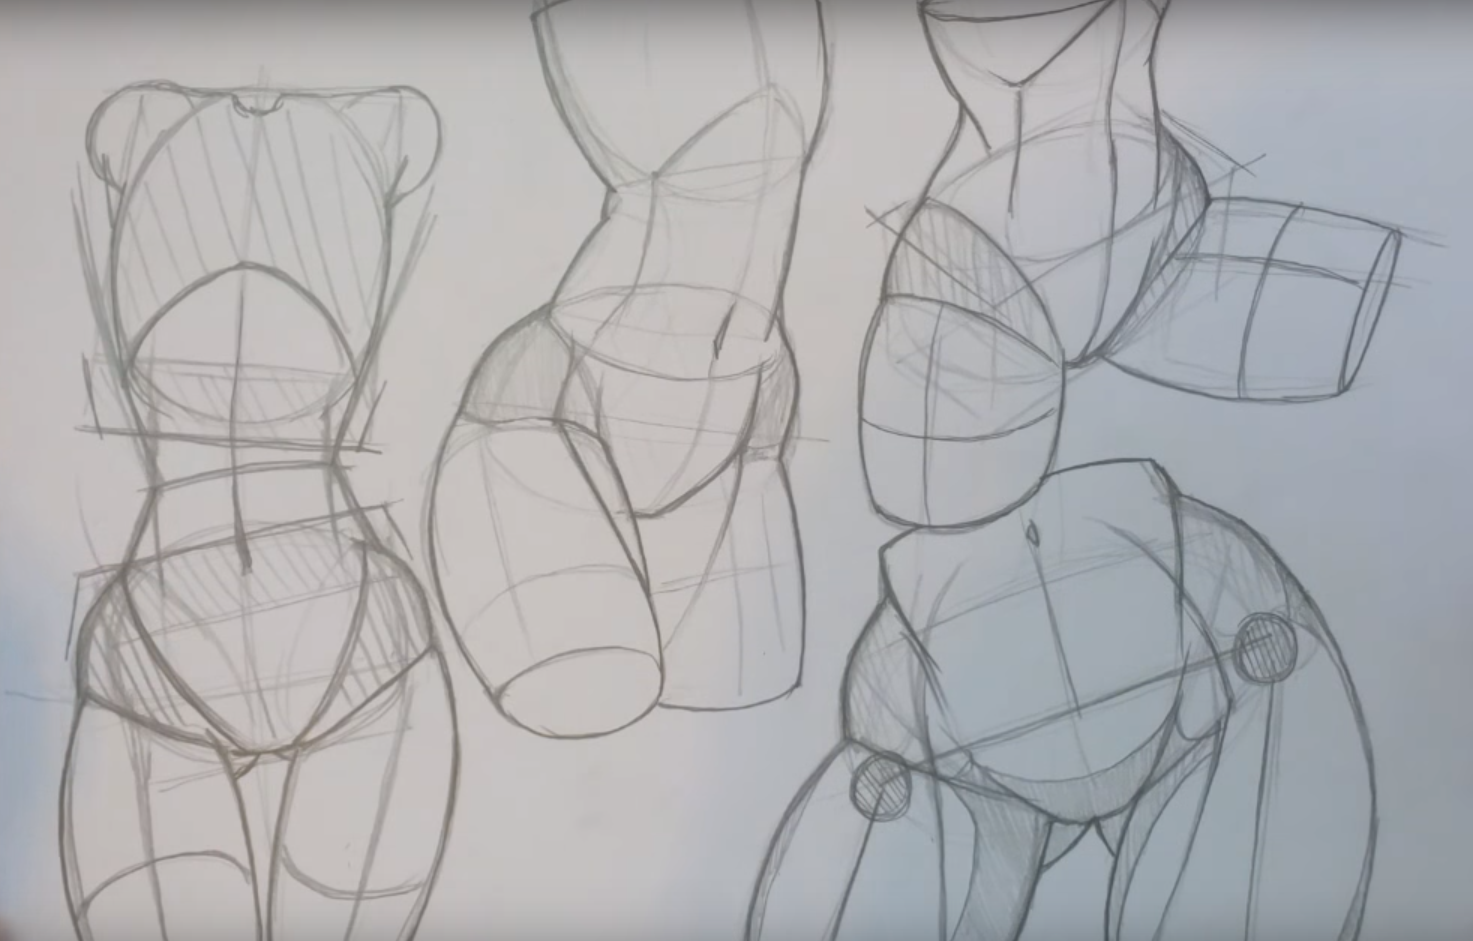 Waist Tut 6 | refs | art | Pinterest | Drawings, Anatomy and Drawing ...